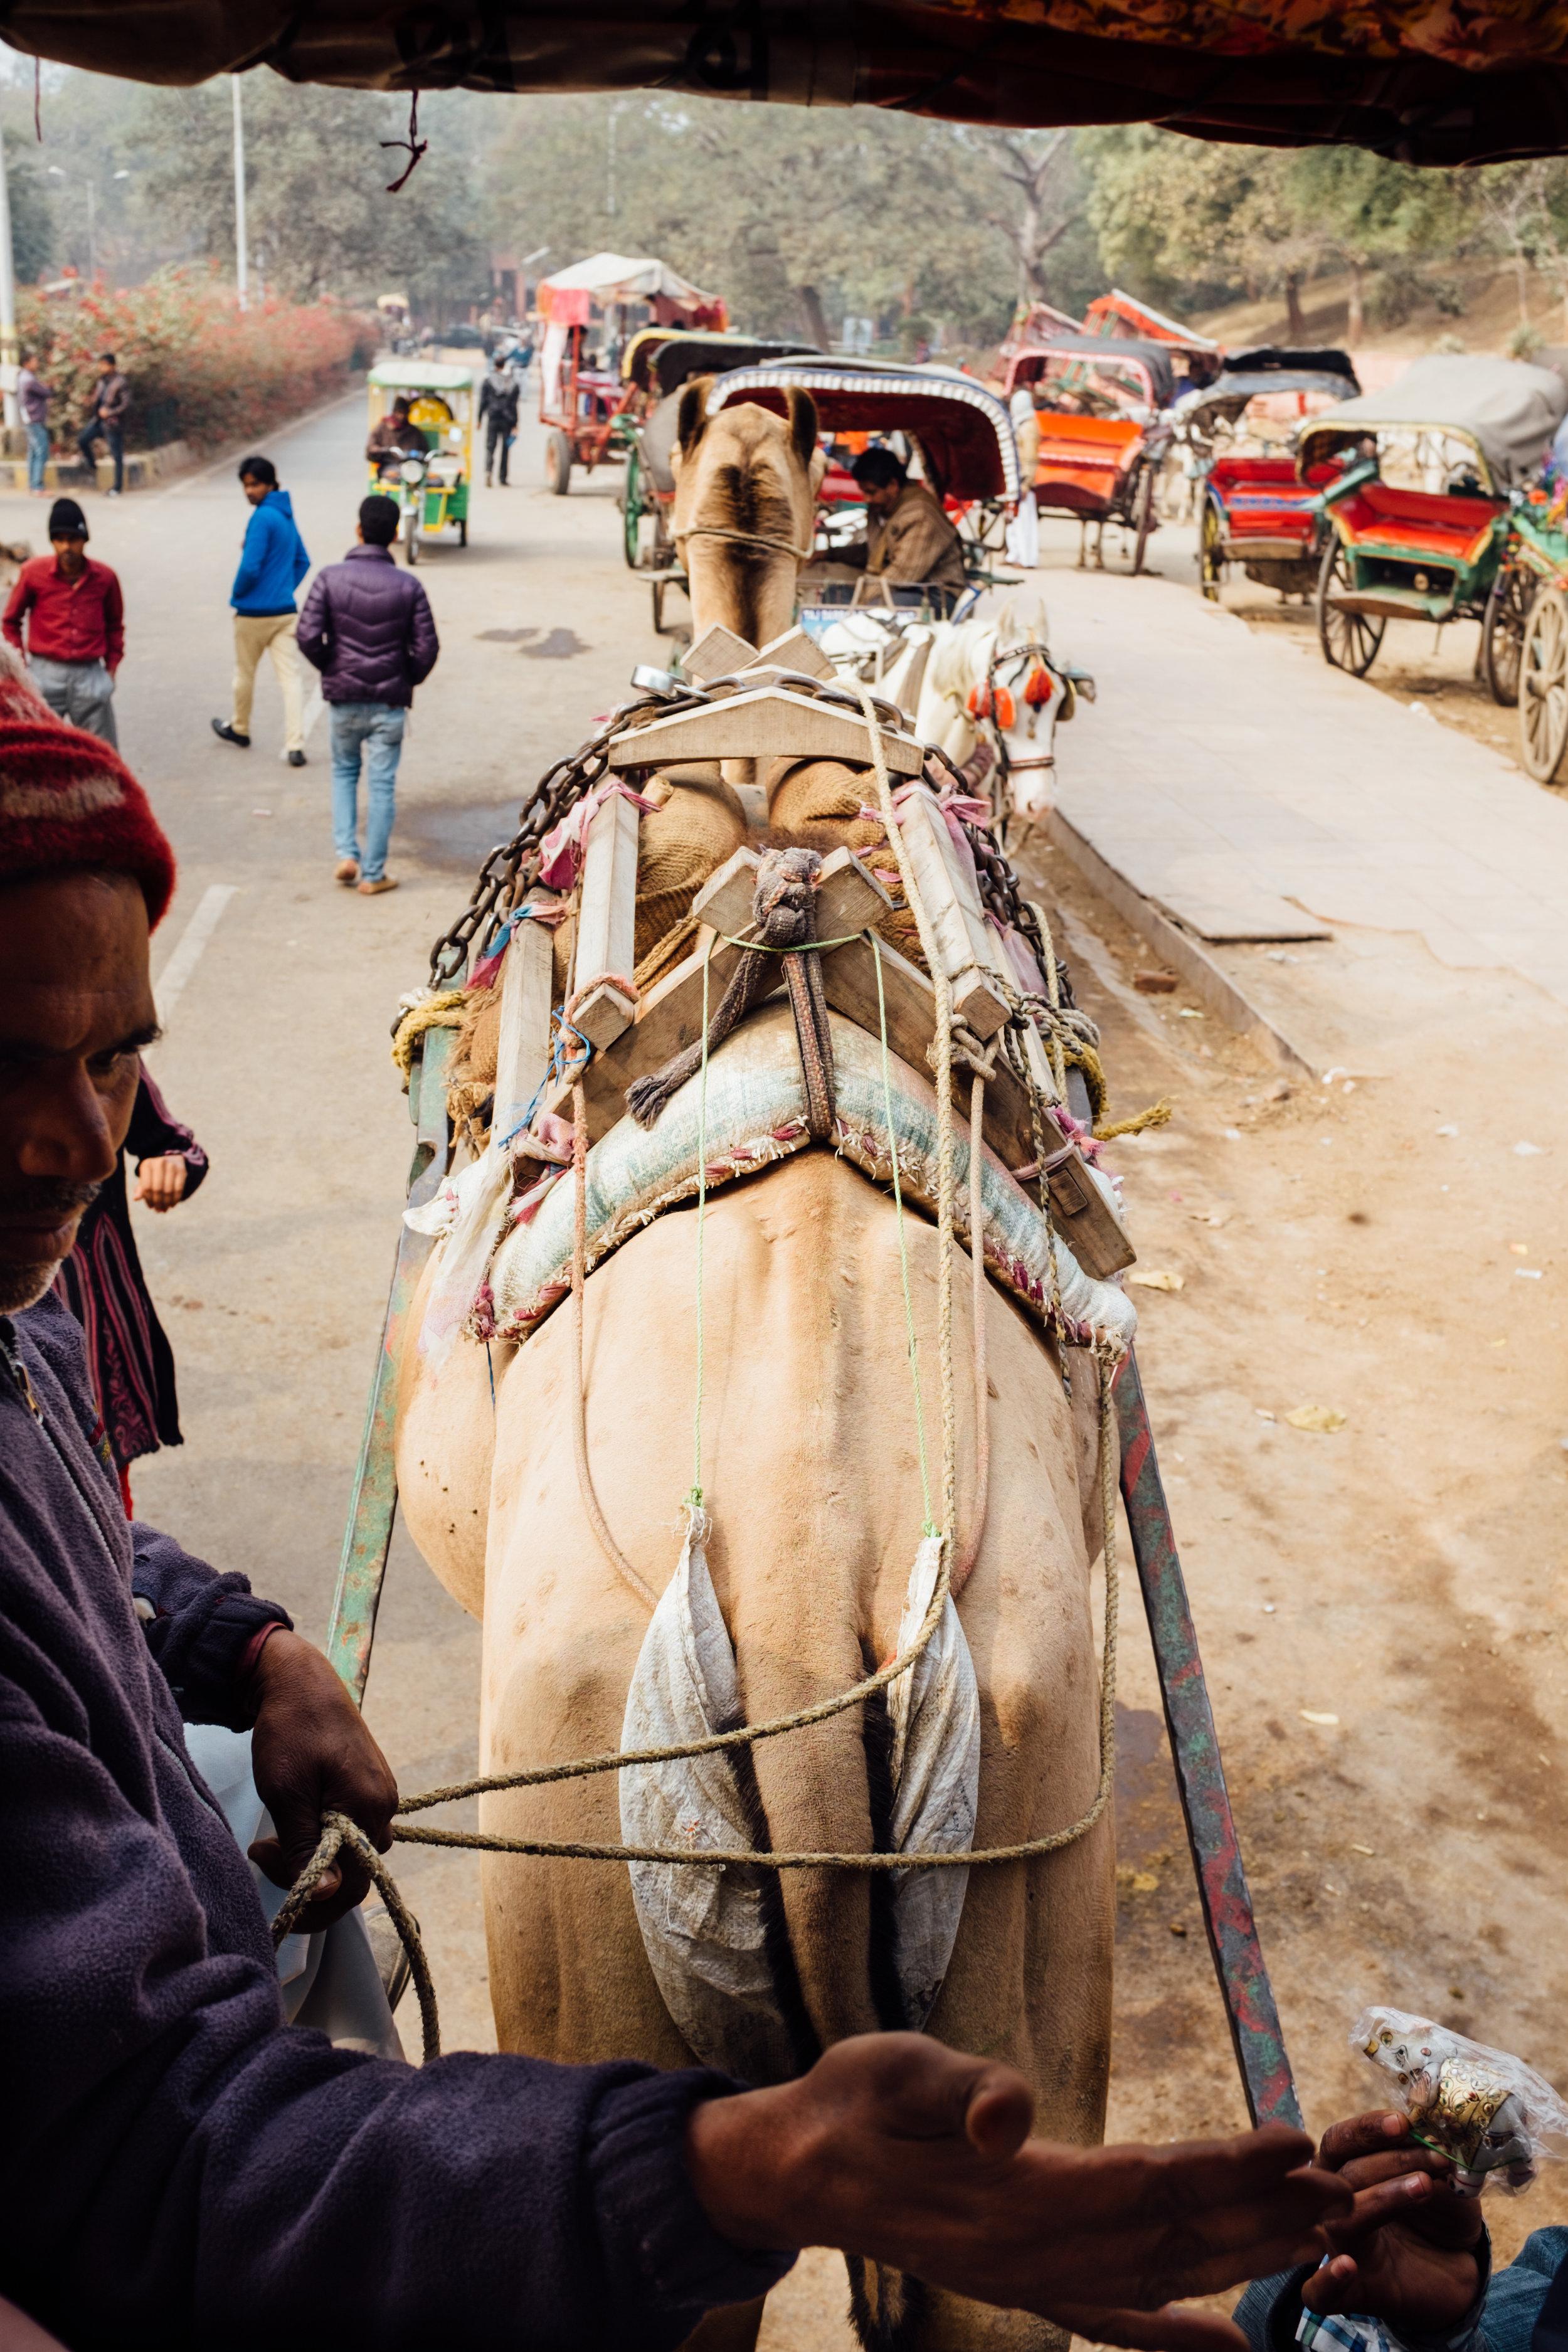 Our camel ride leaving the Taj